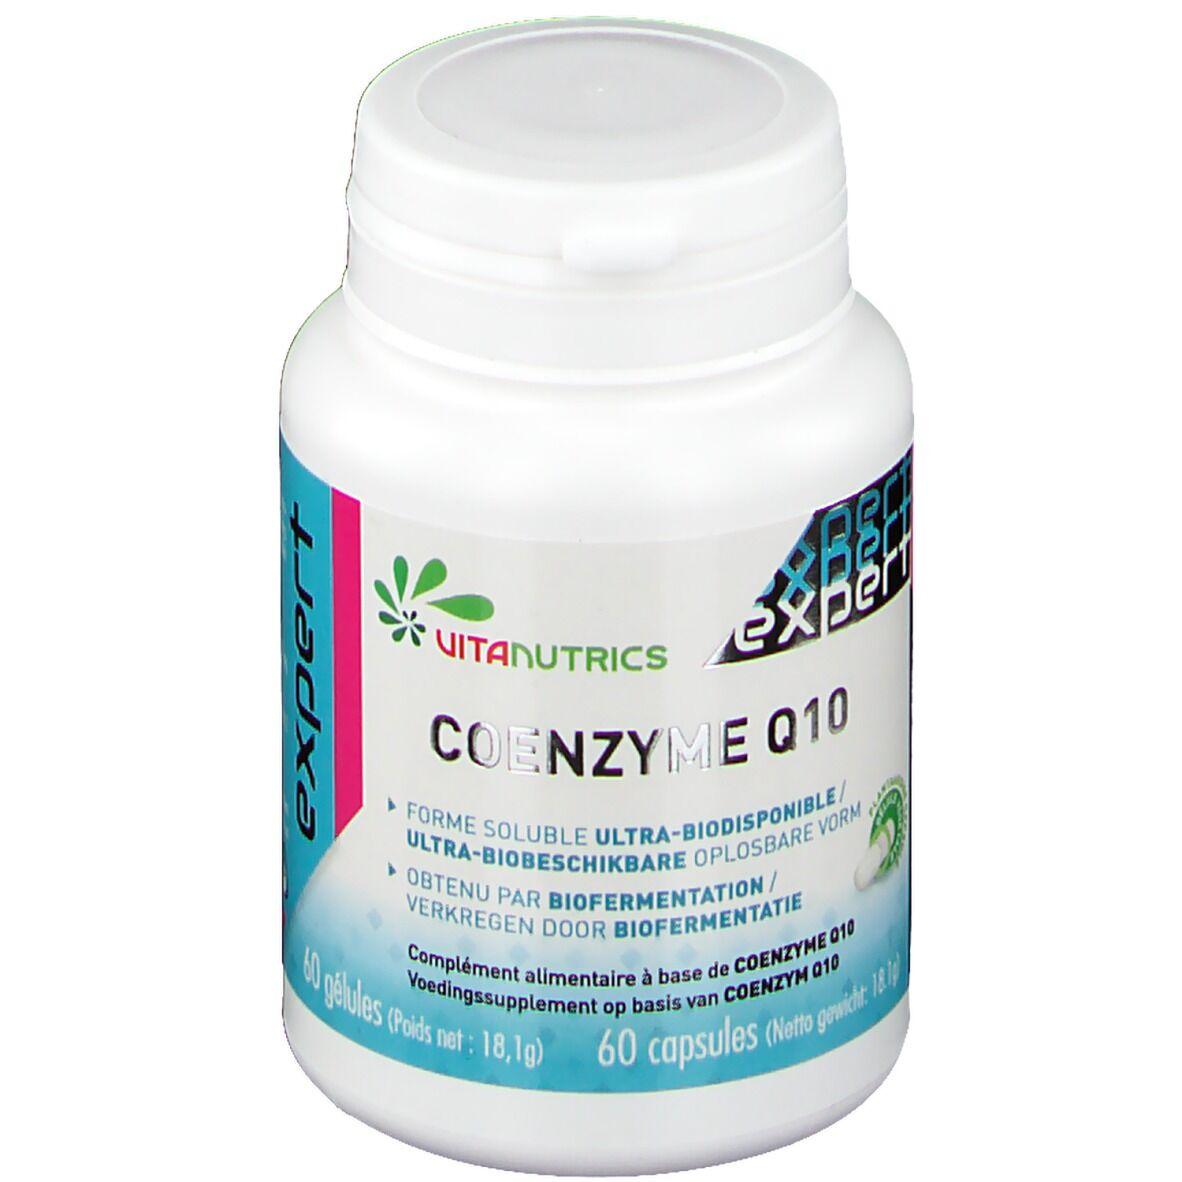 Vitanutrics Expert Coenzyme Q10 pc(s) capsule(s)